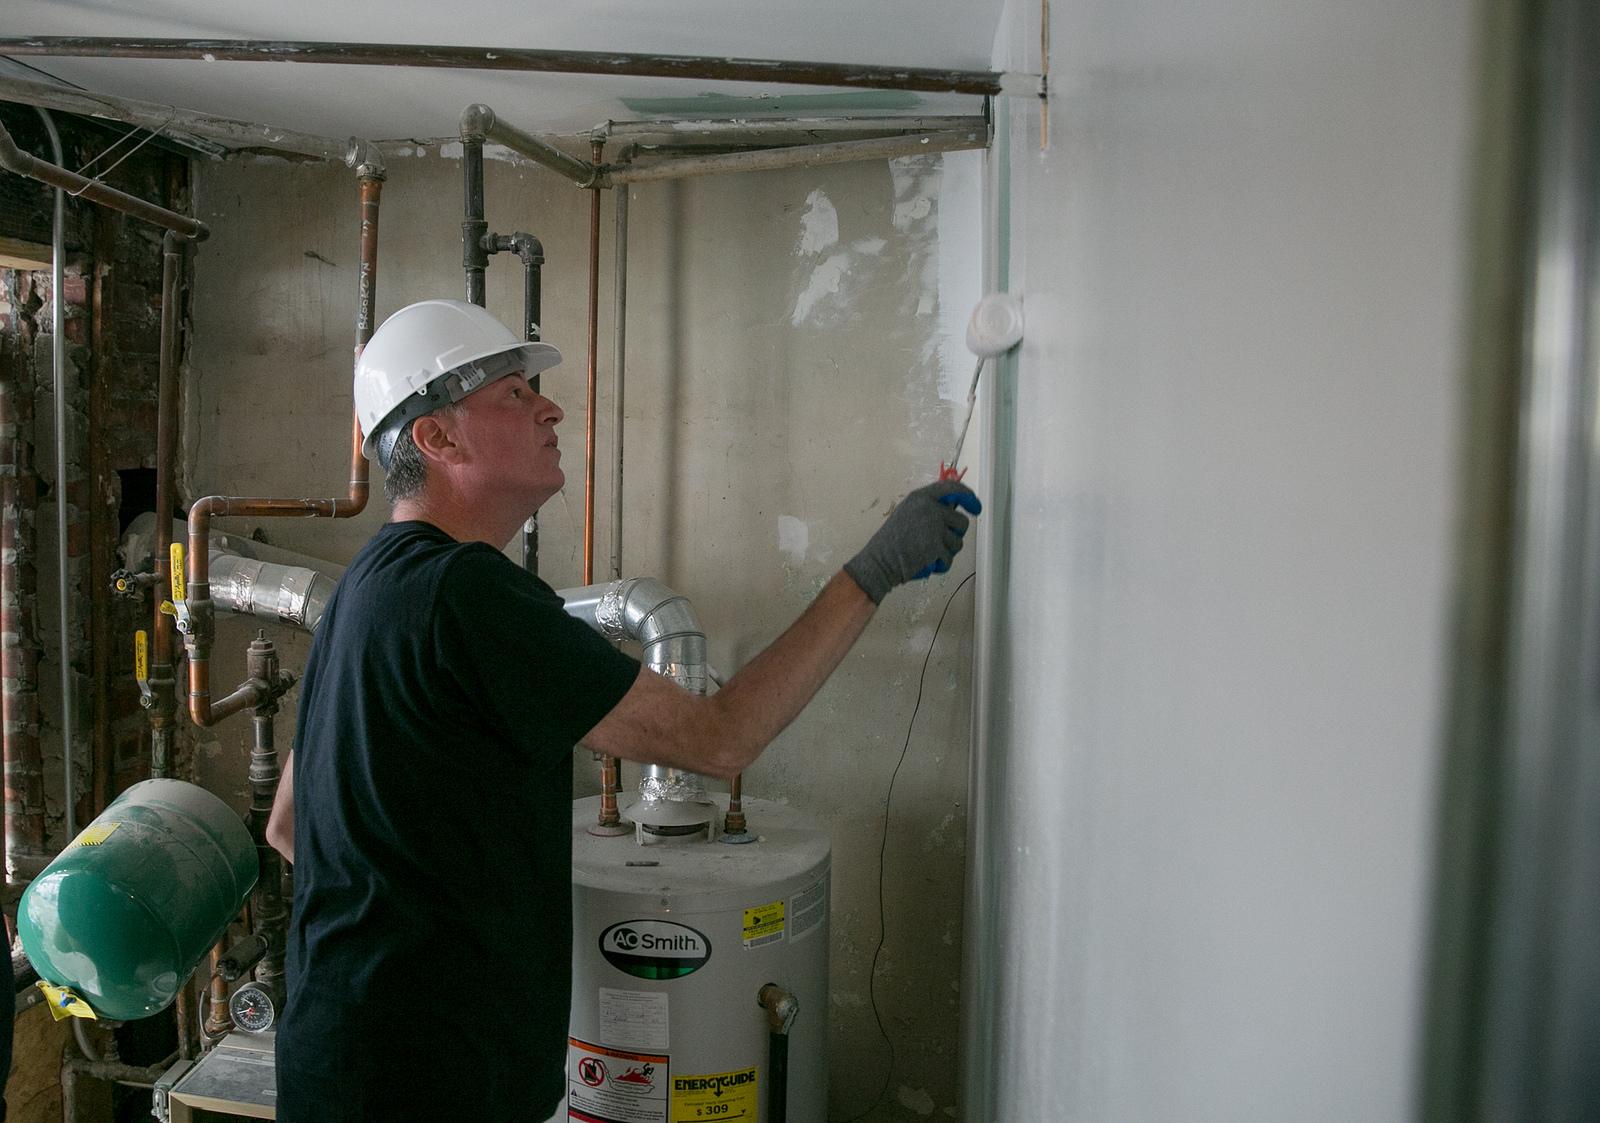 Mayor Bill de Blasio painting a home in Coney Island. (Photo: William Alatriste/New York City Council)